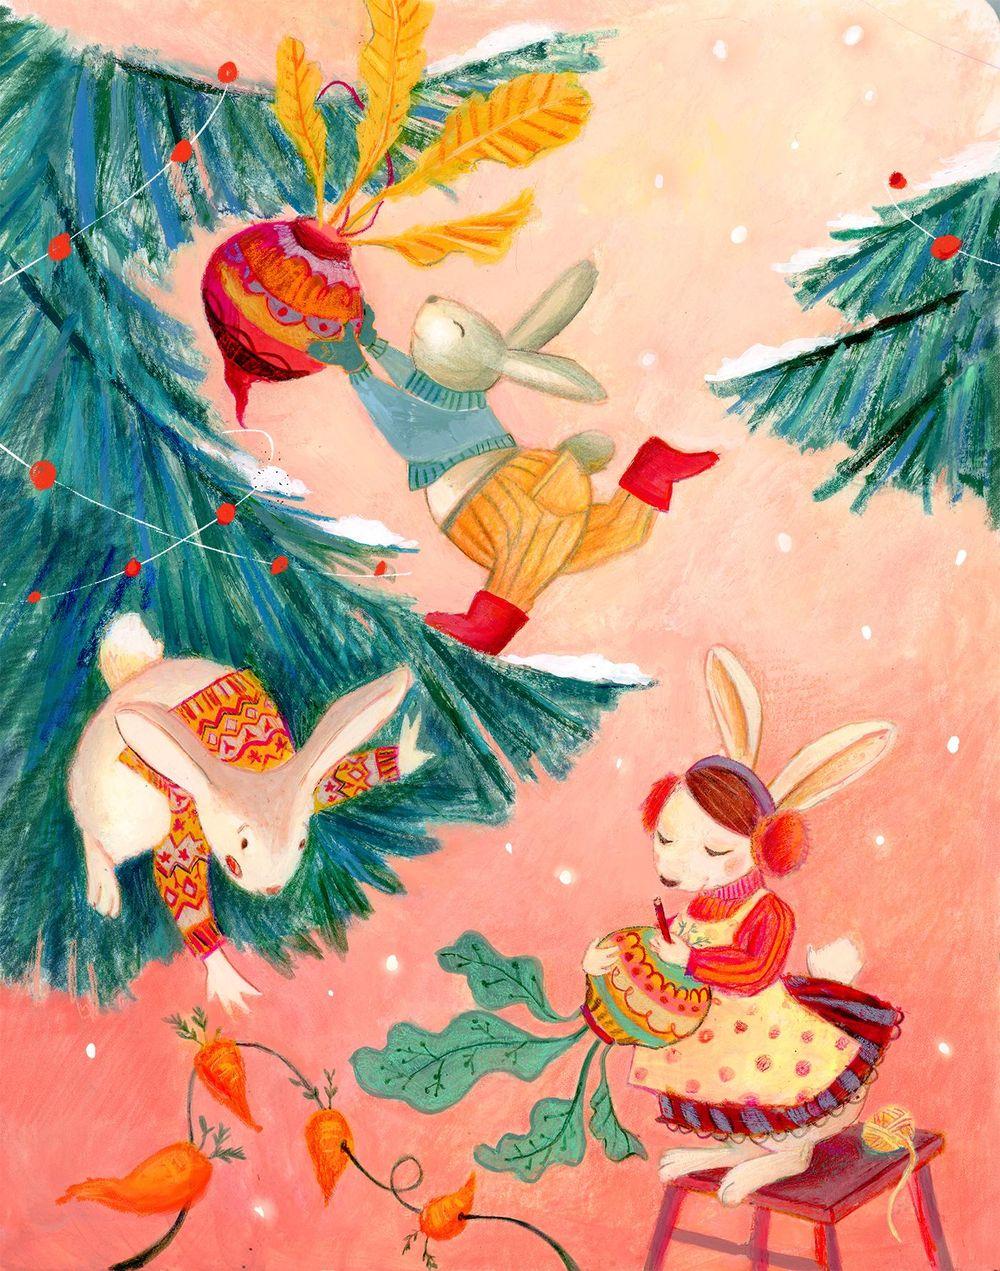 Illustrations for children- color studies - image 5 - student project